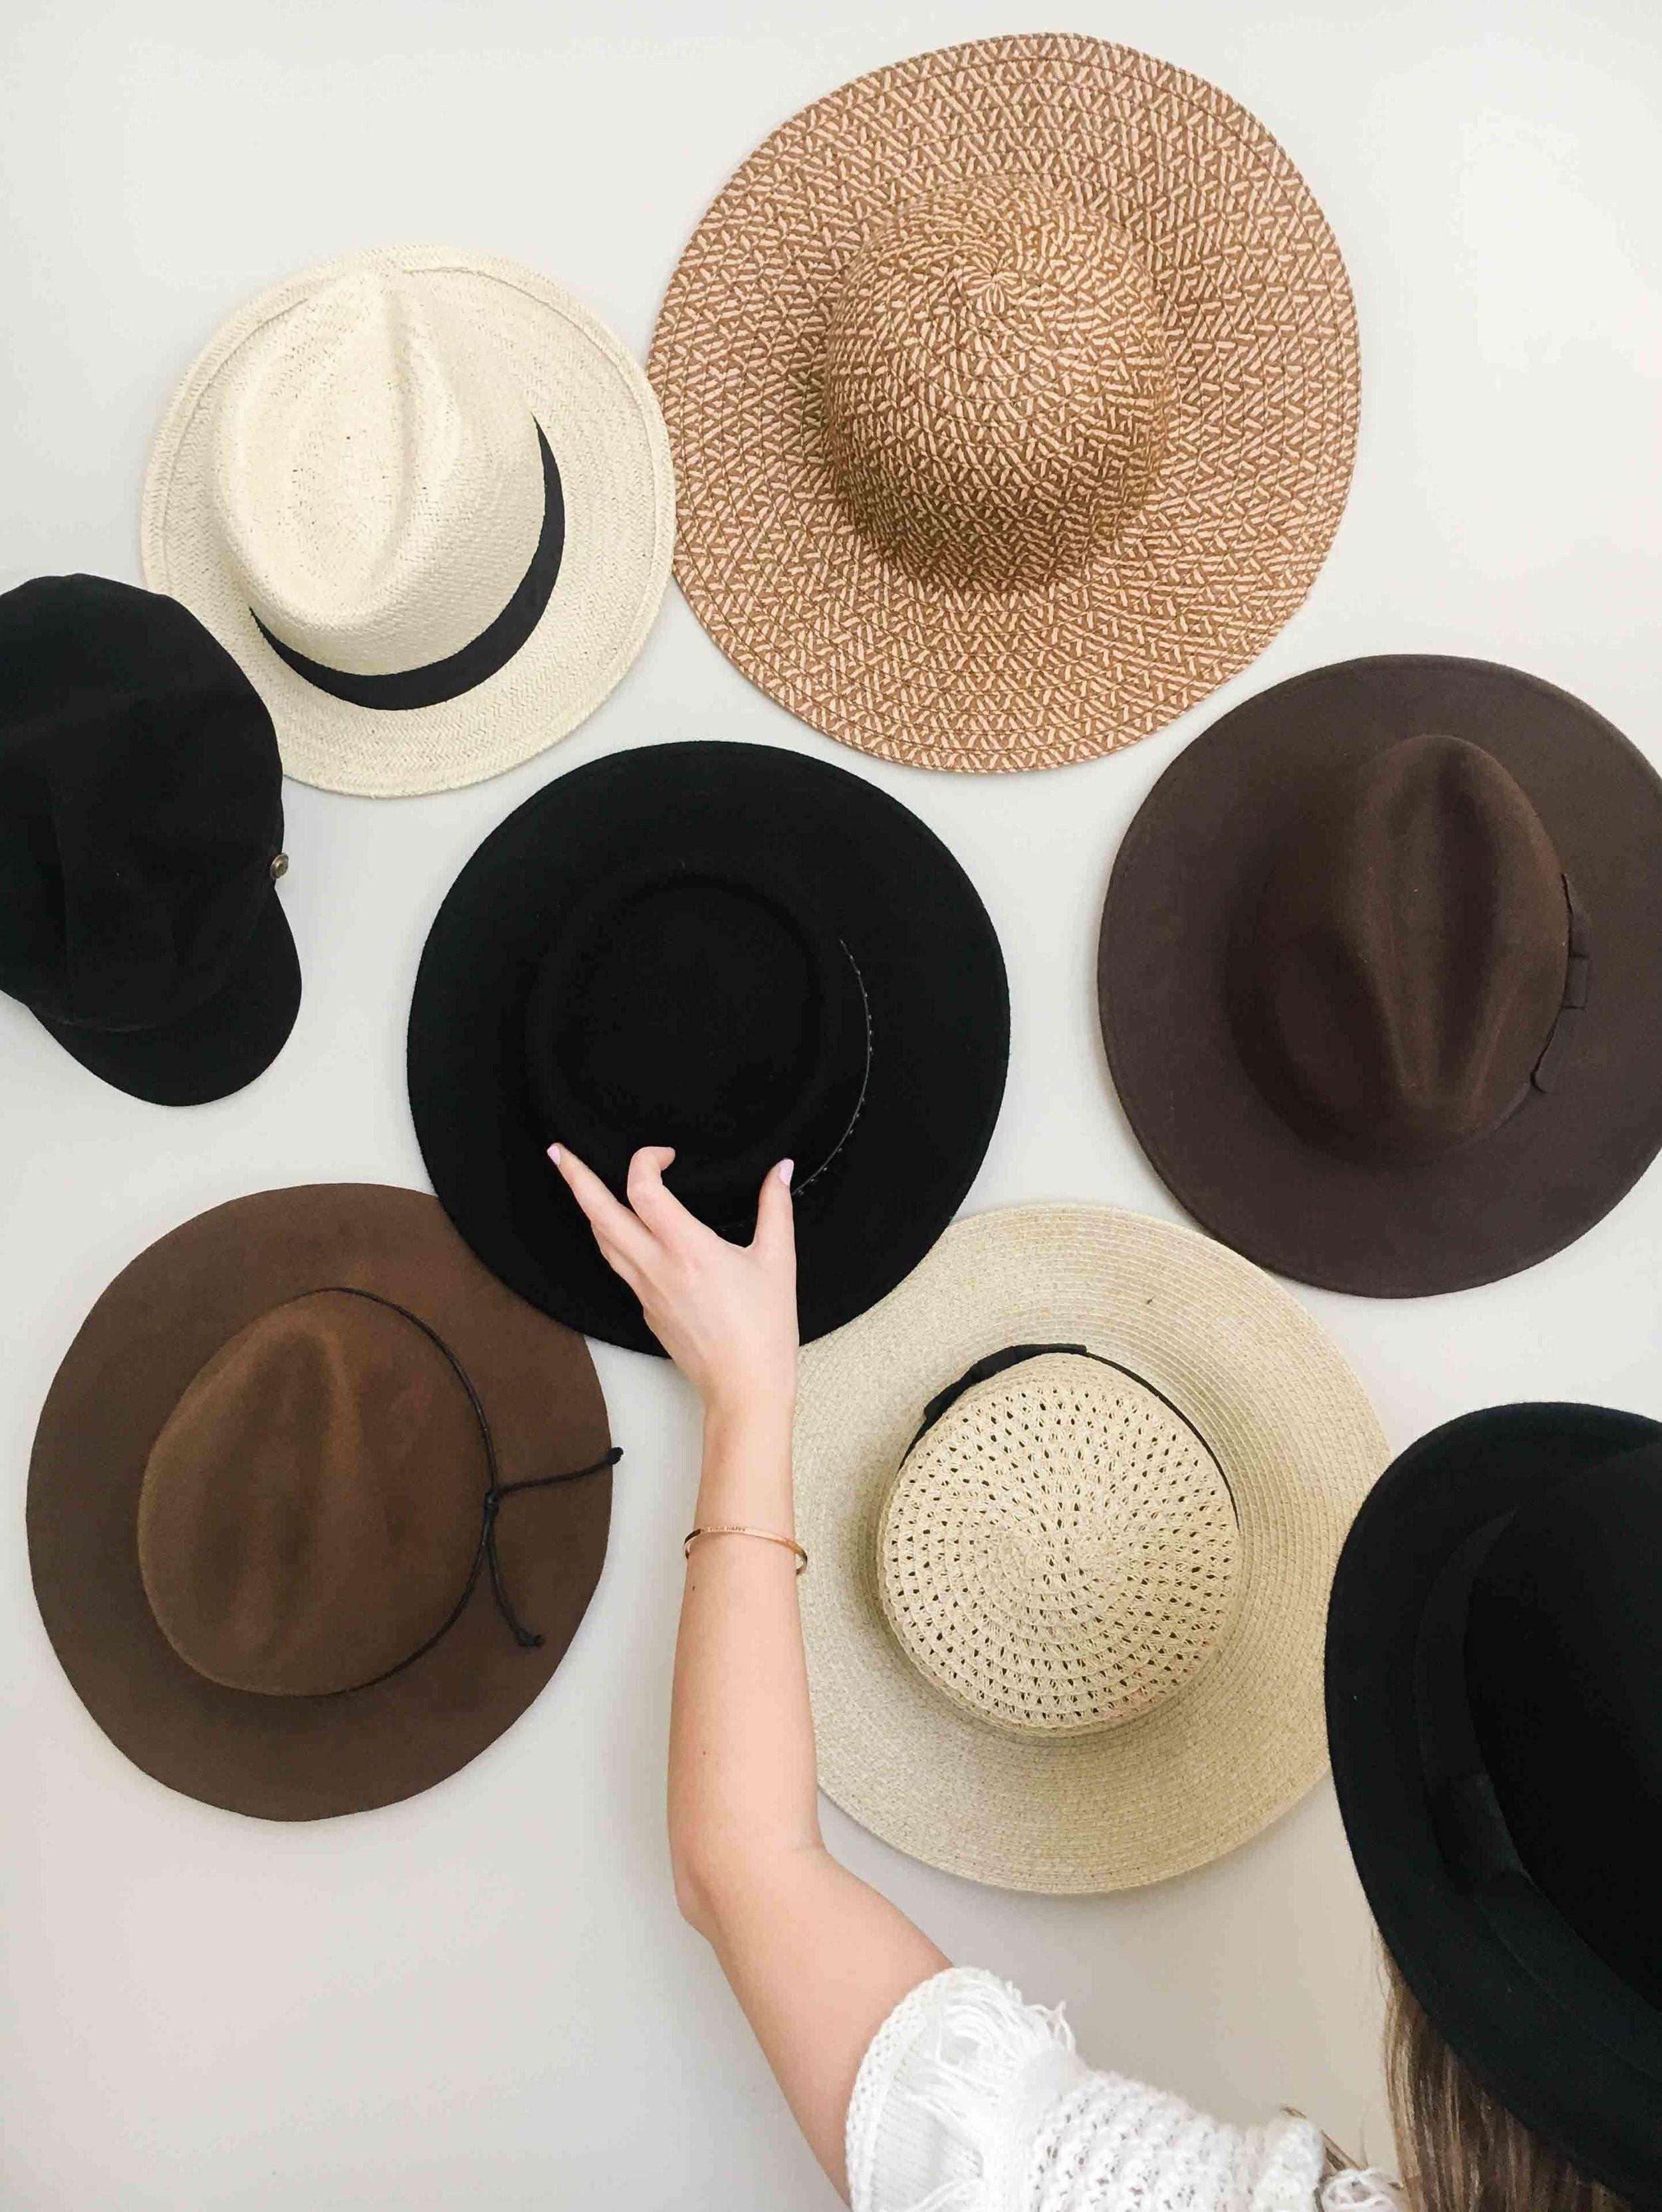 Diy Hat Wall Gallery Display Amanda Puleo In 2020 Wall Hats Hanging Hats Wall Hats Display